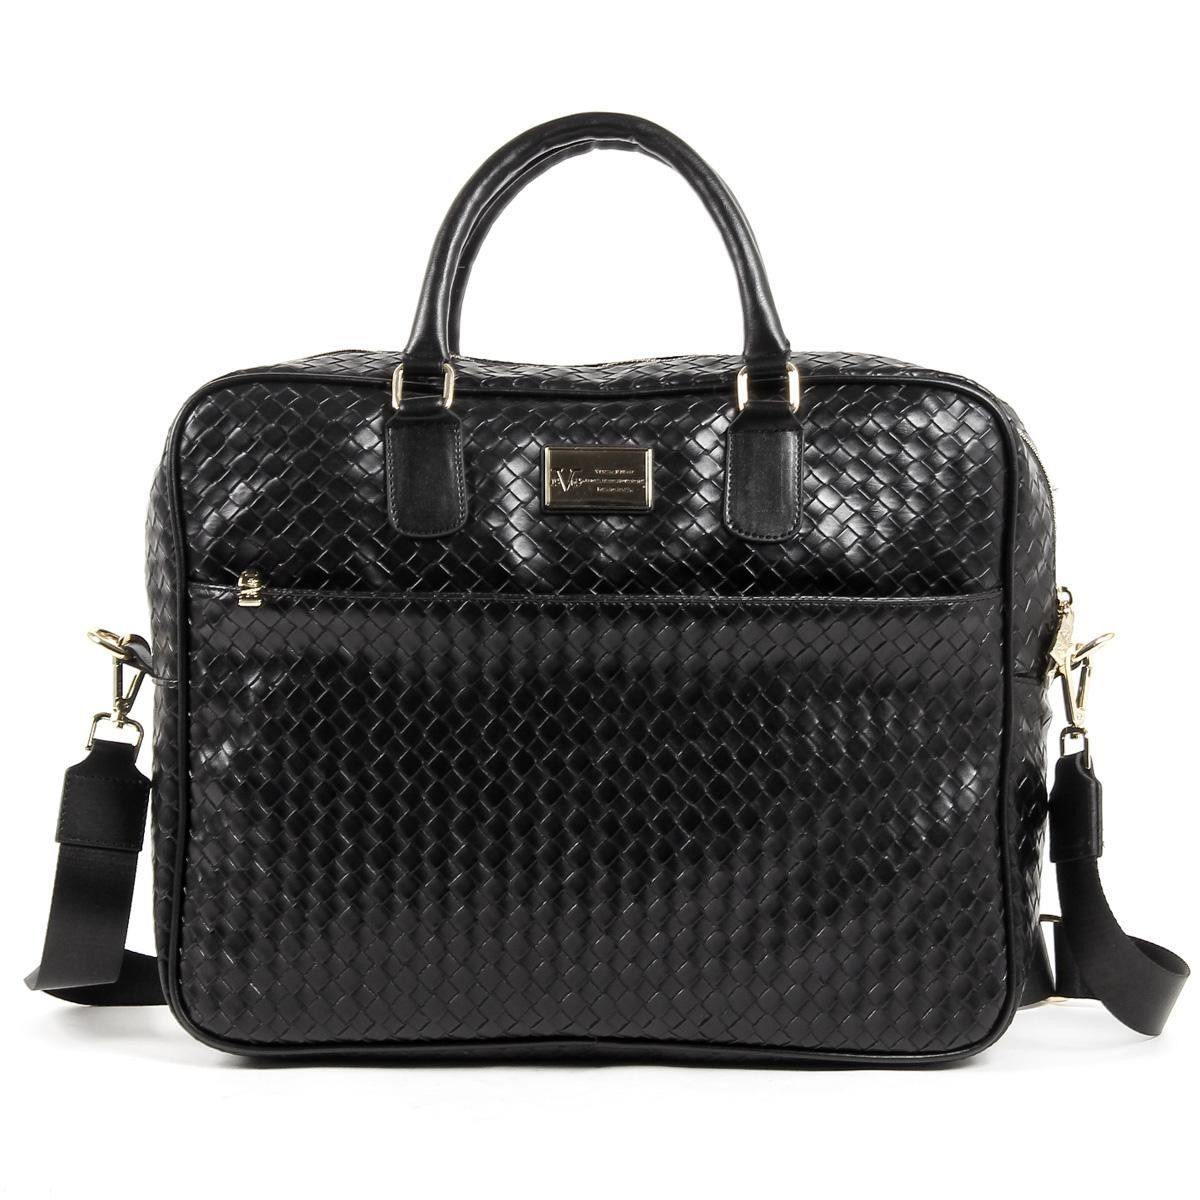 Versace 19.69 Abbigliamento Sportivo Srl Milano Italia Mens Bag V1969019B BLACK